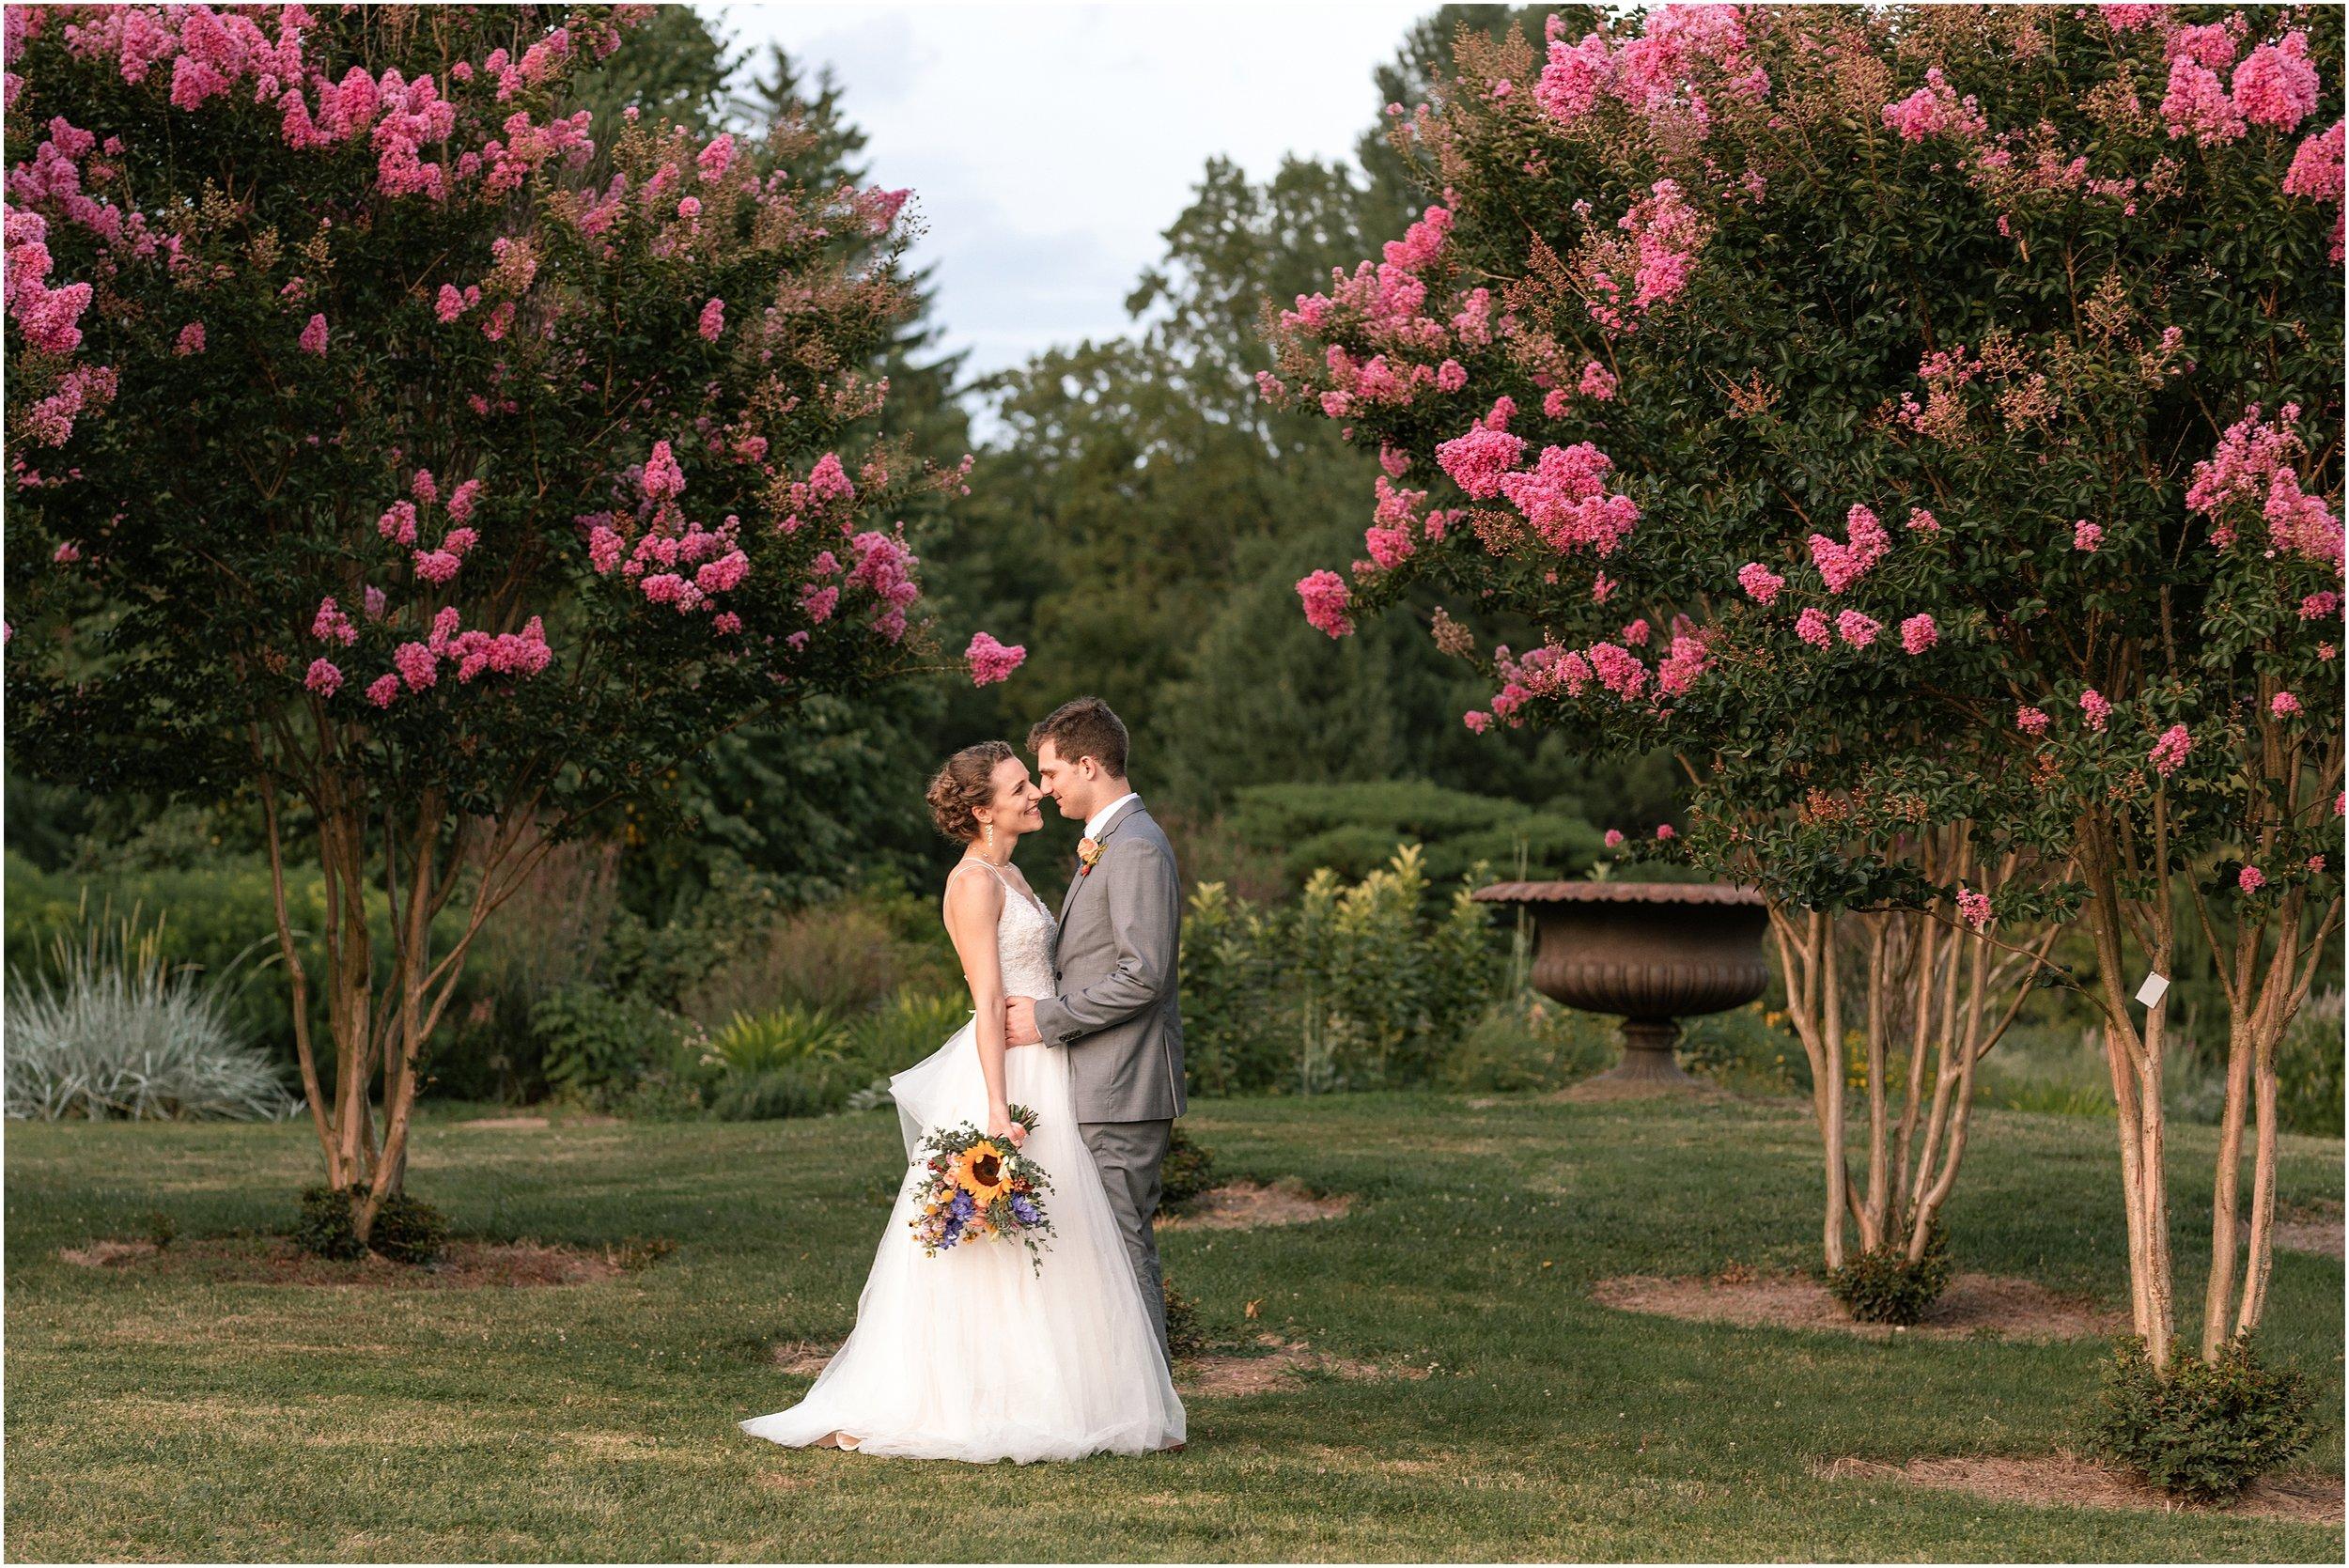 hannah leigh photography Cylburn Arboretum Wedding Baltimore, MD_3460.jpg